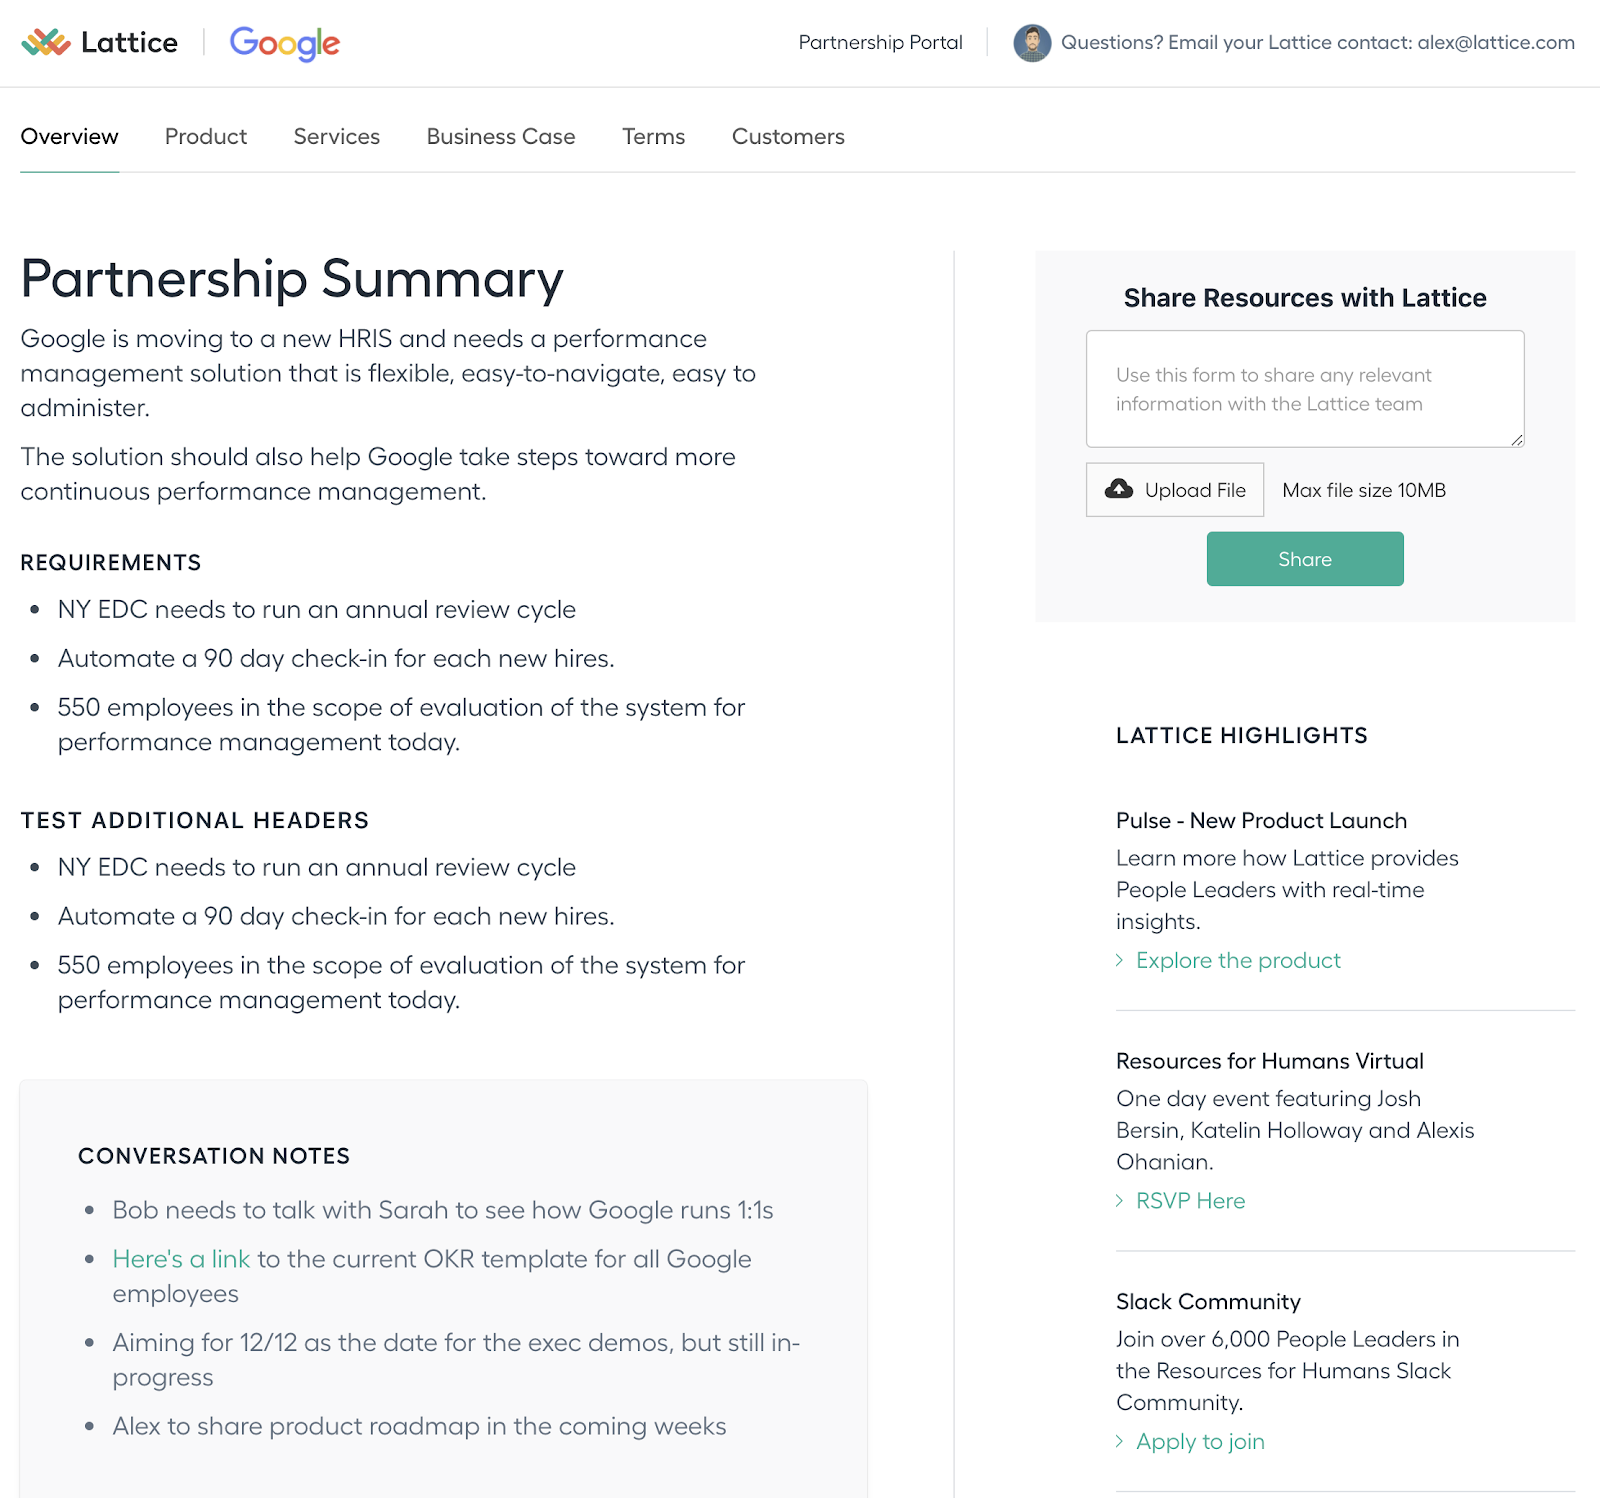 lattice partnership page